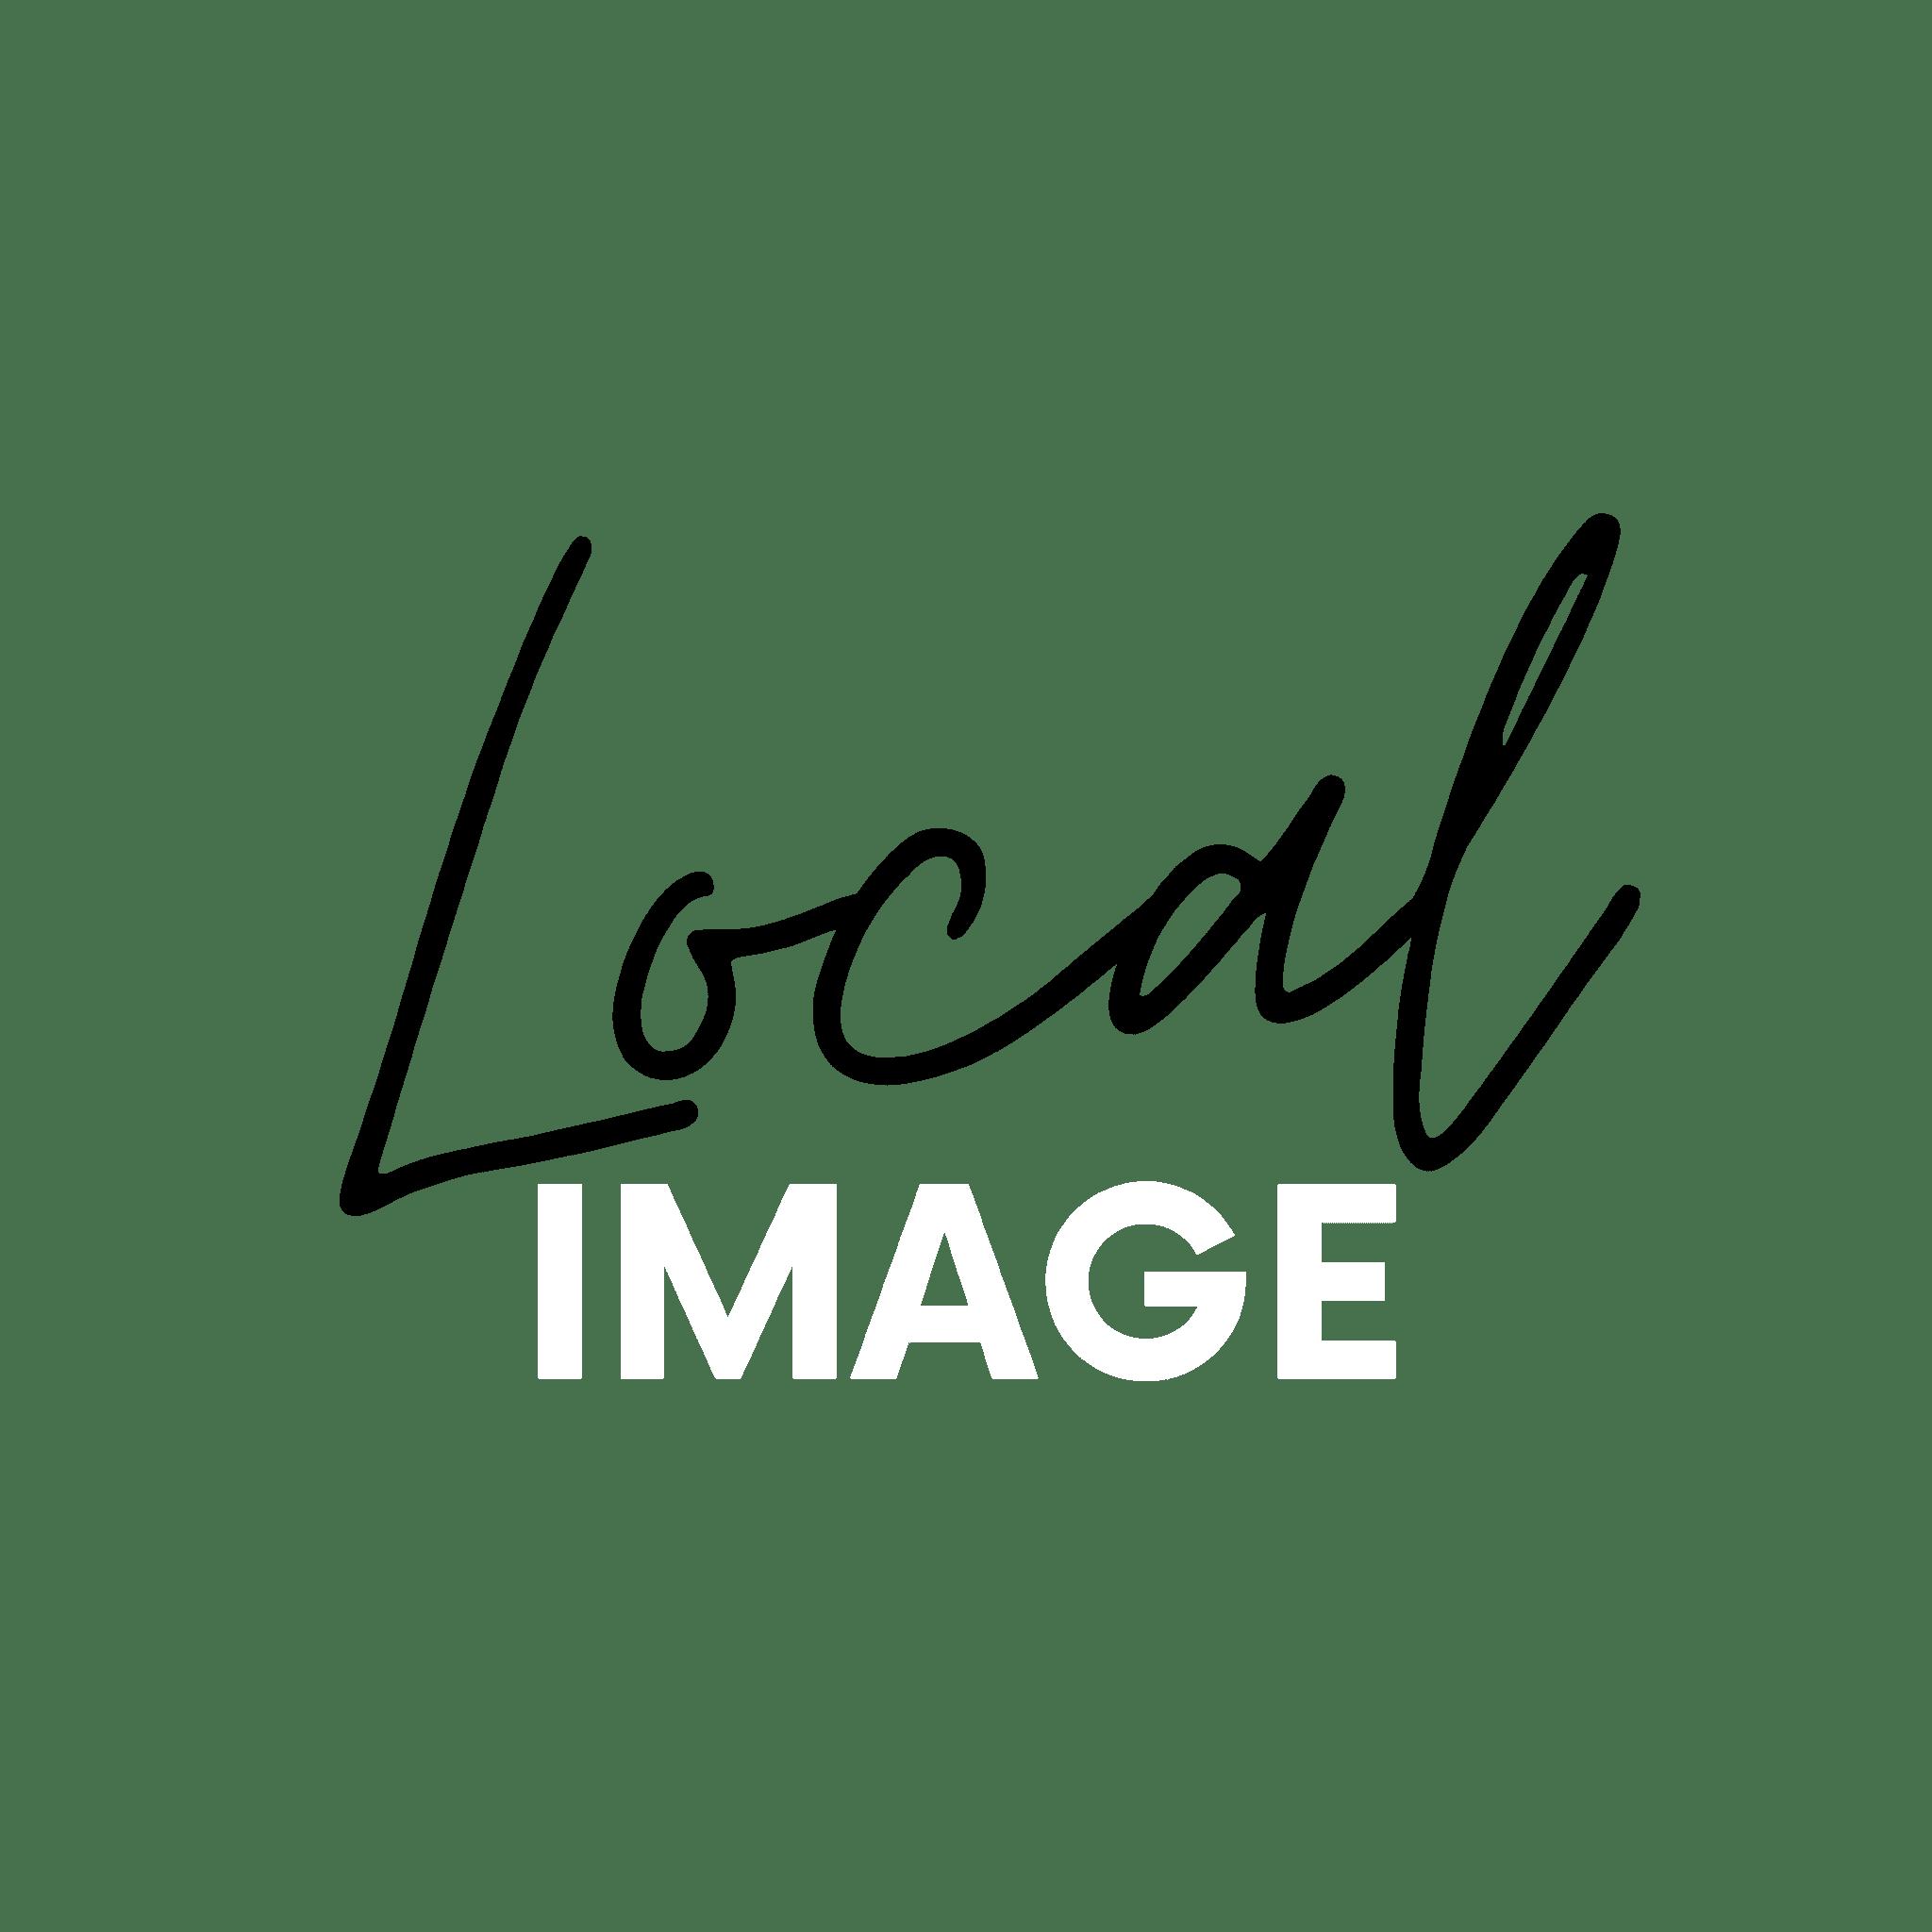 Local Image Co